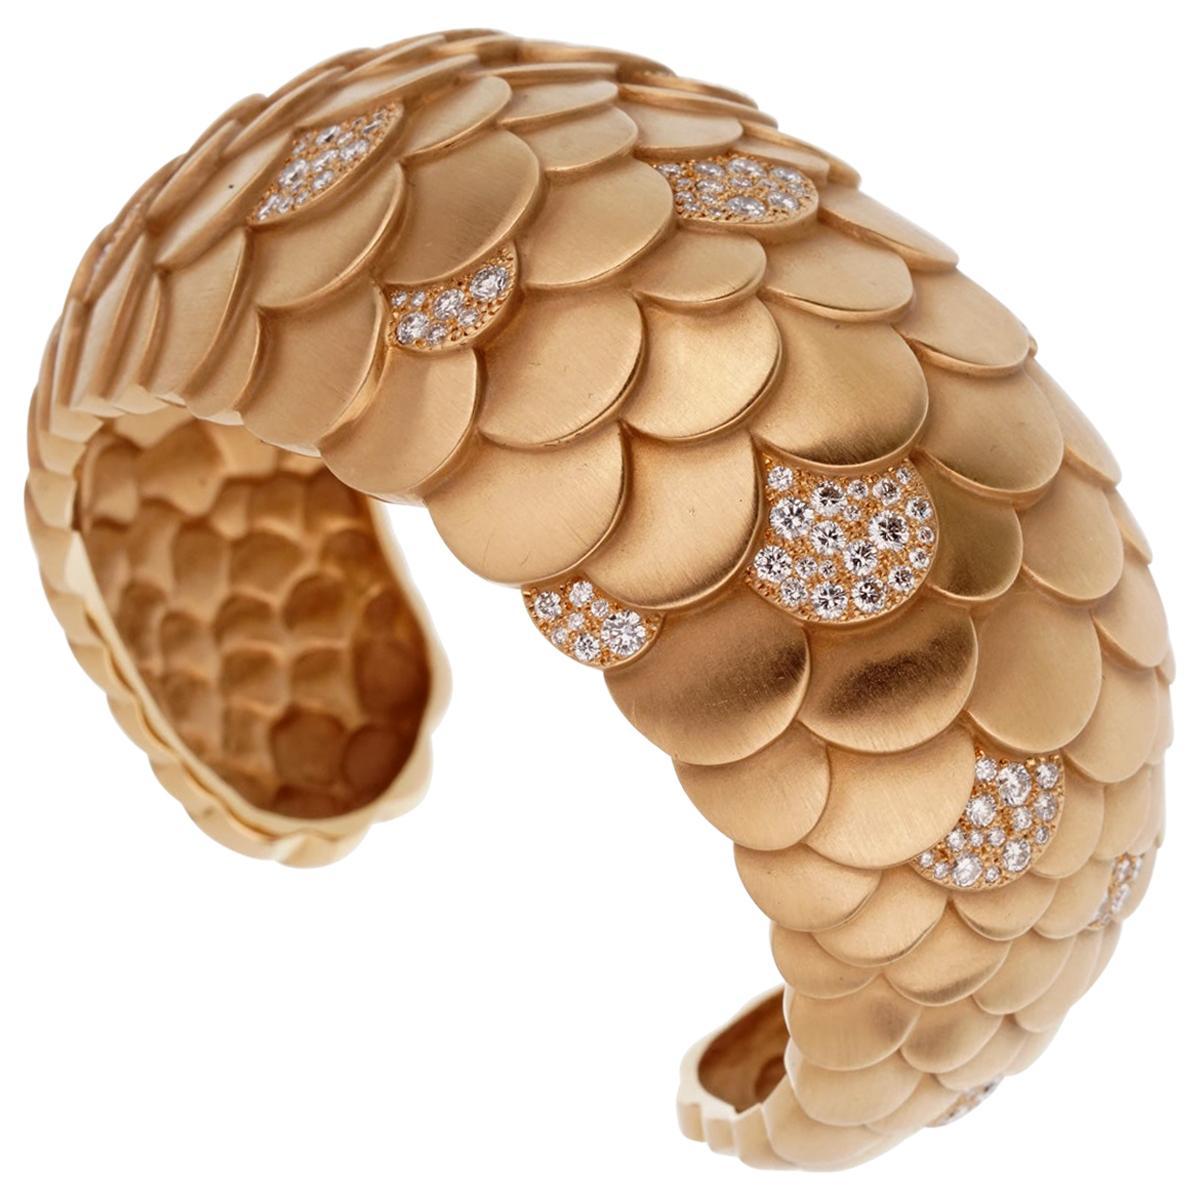 Pomellato Rose Gold Diamond Cuff Bangle Bracelet